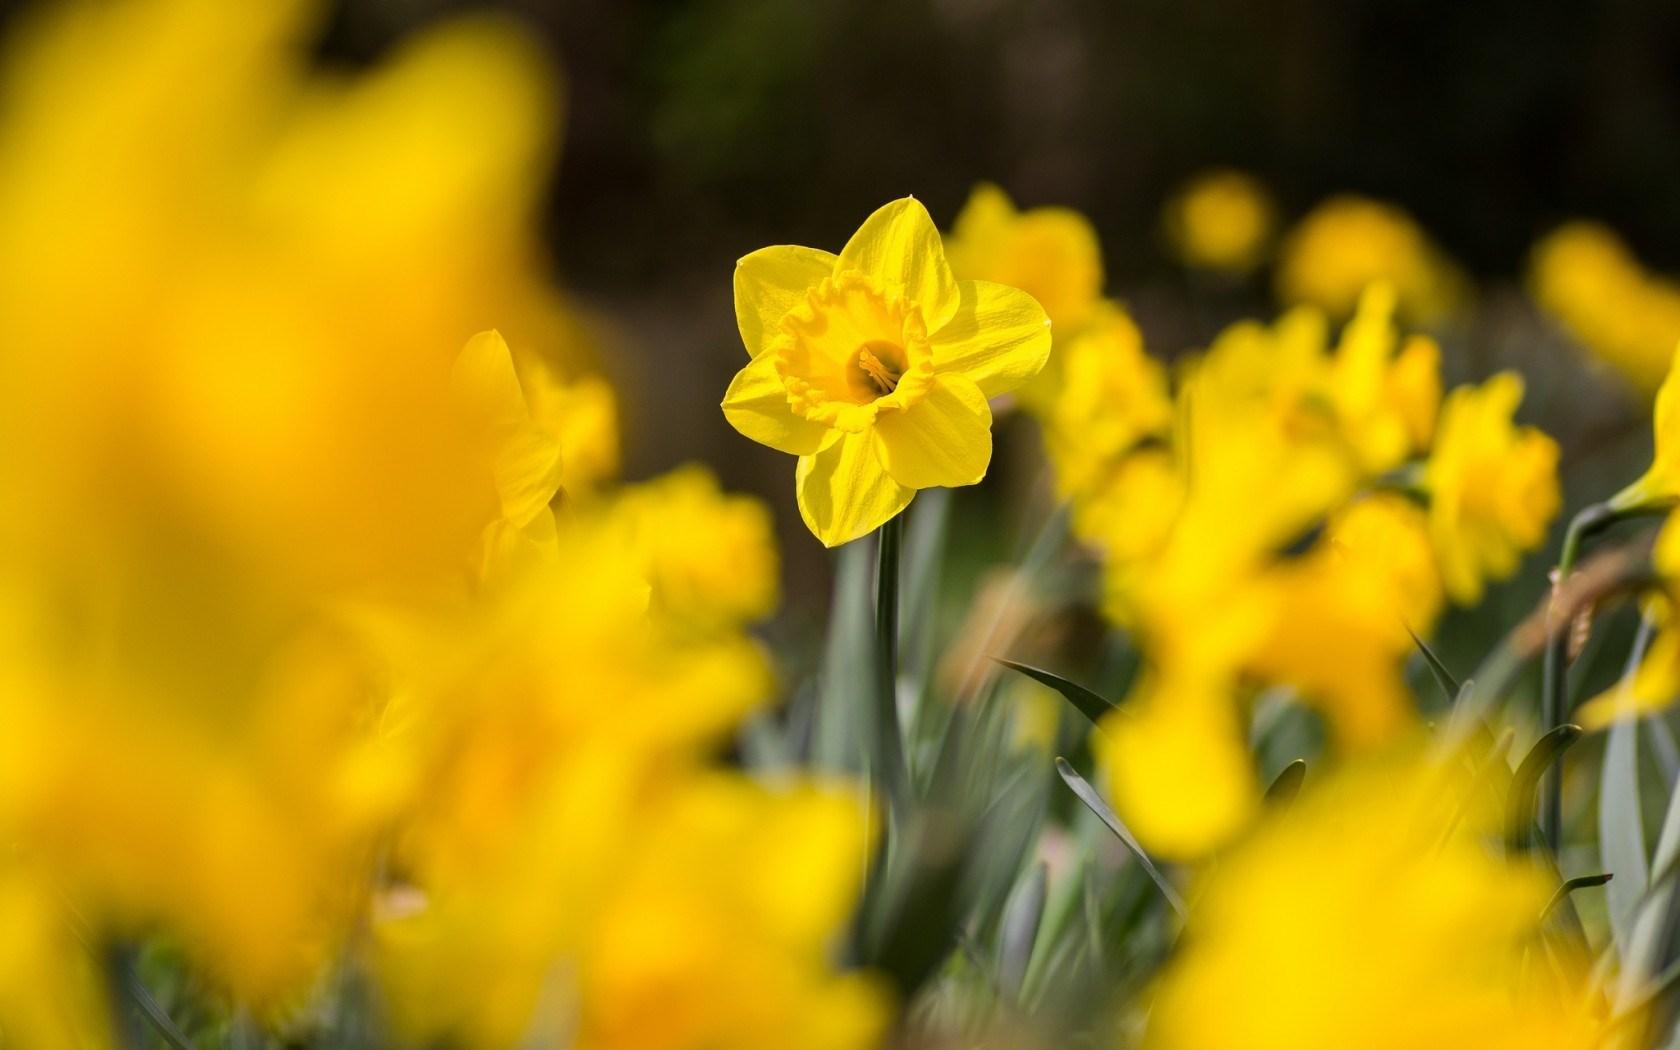 daffodils wallpaper photos hd 20828